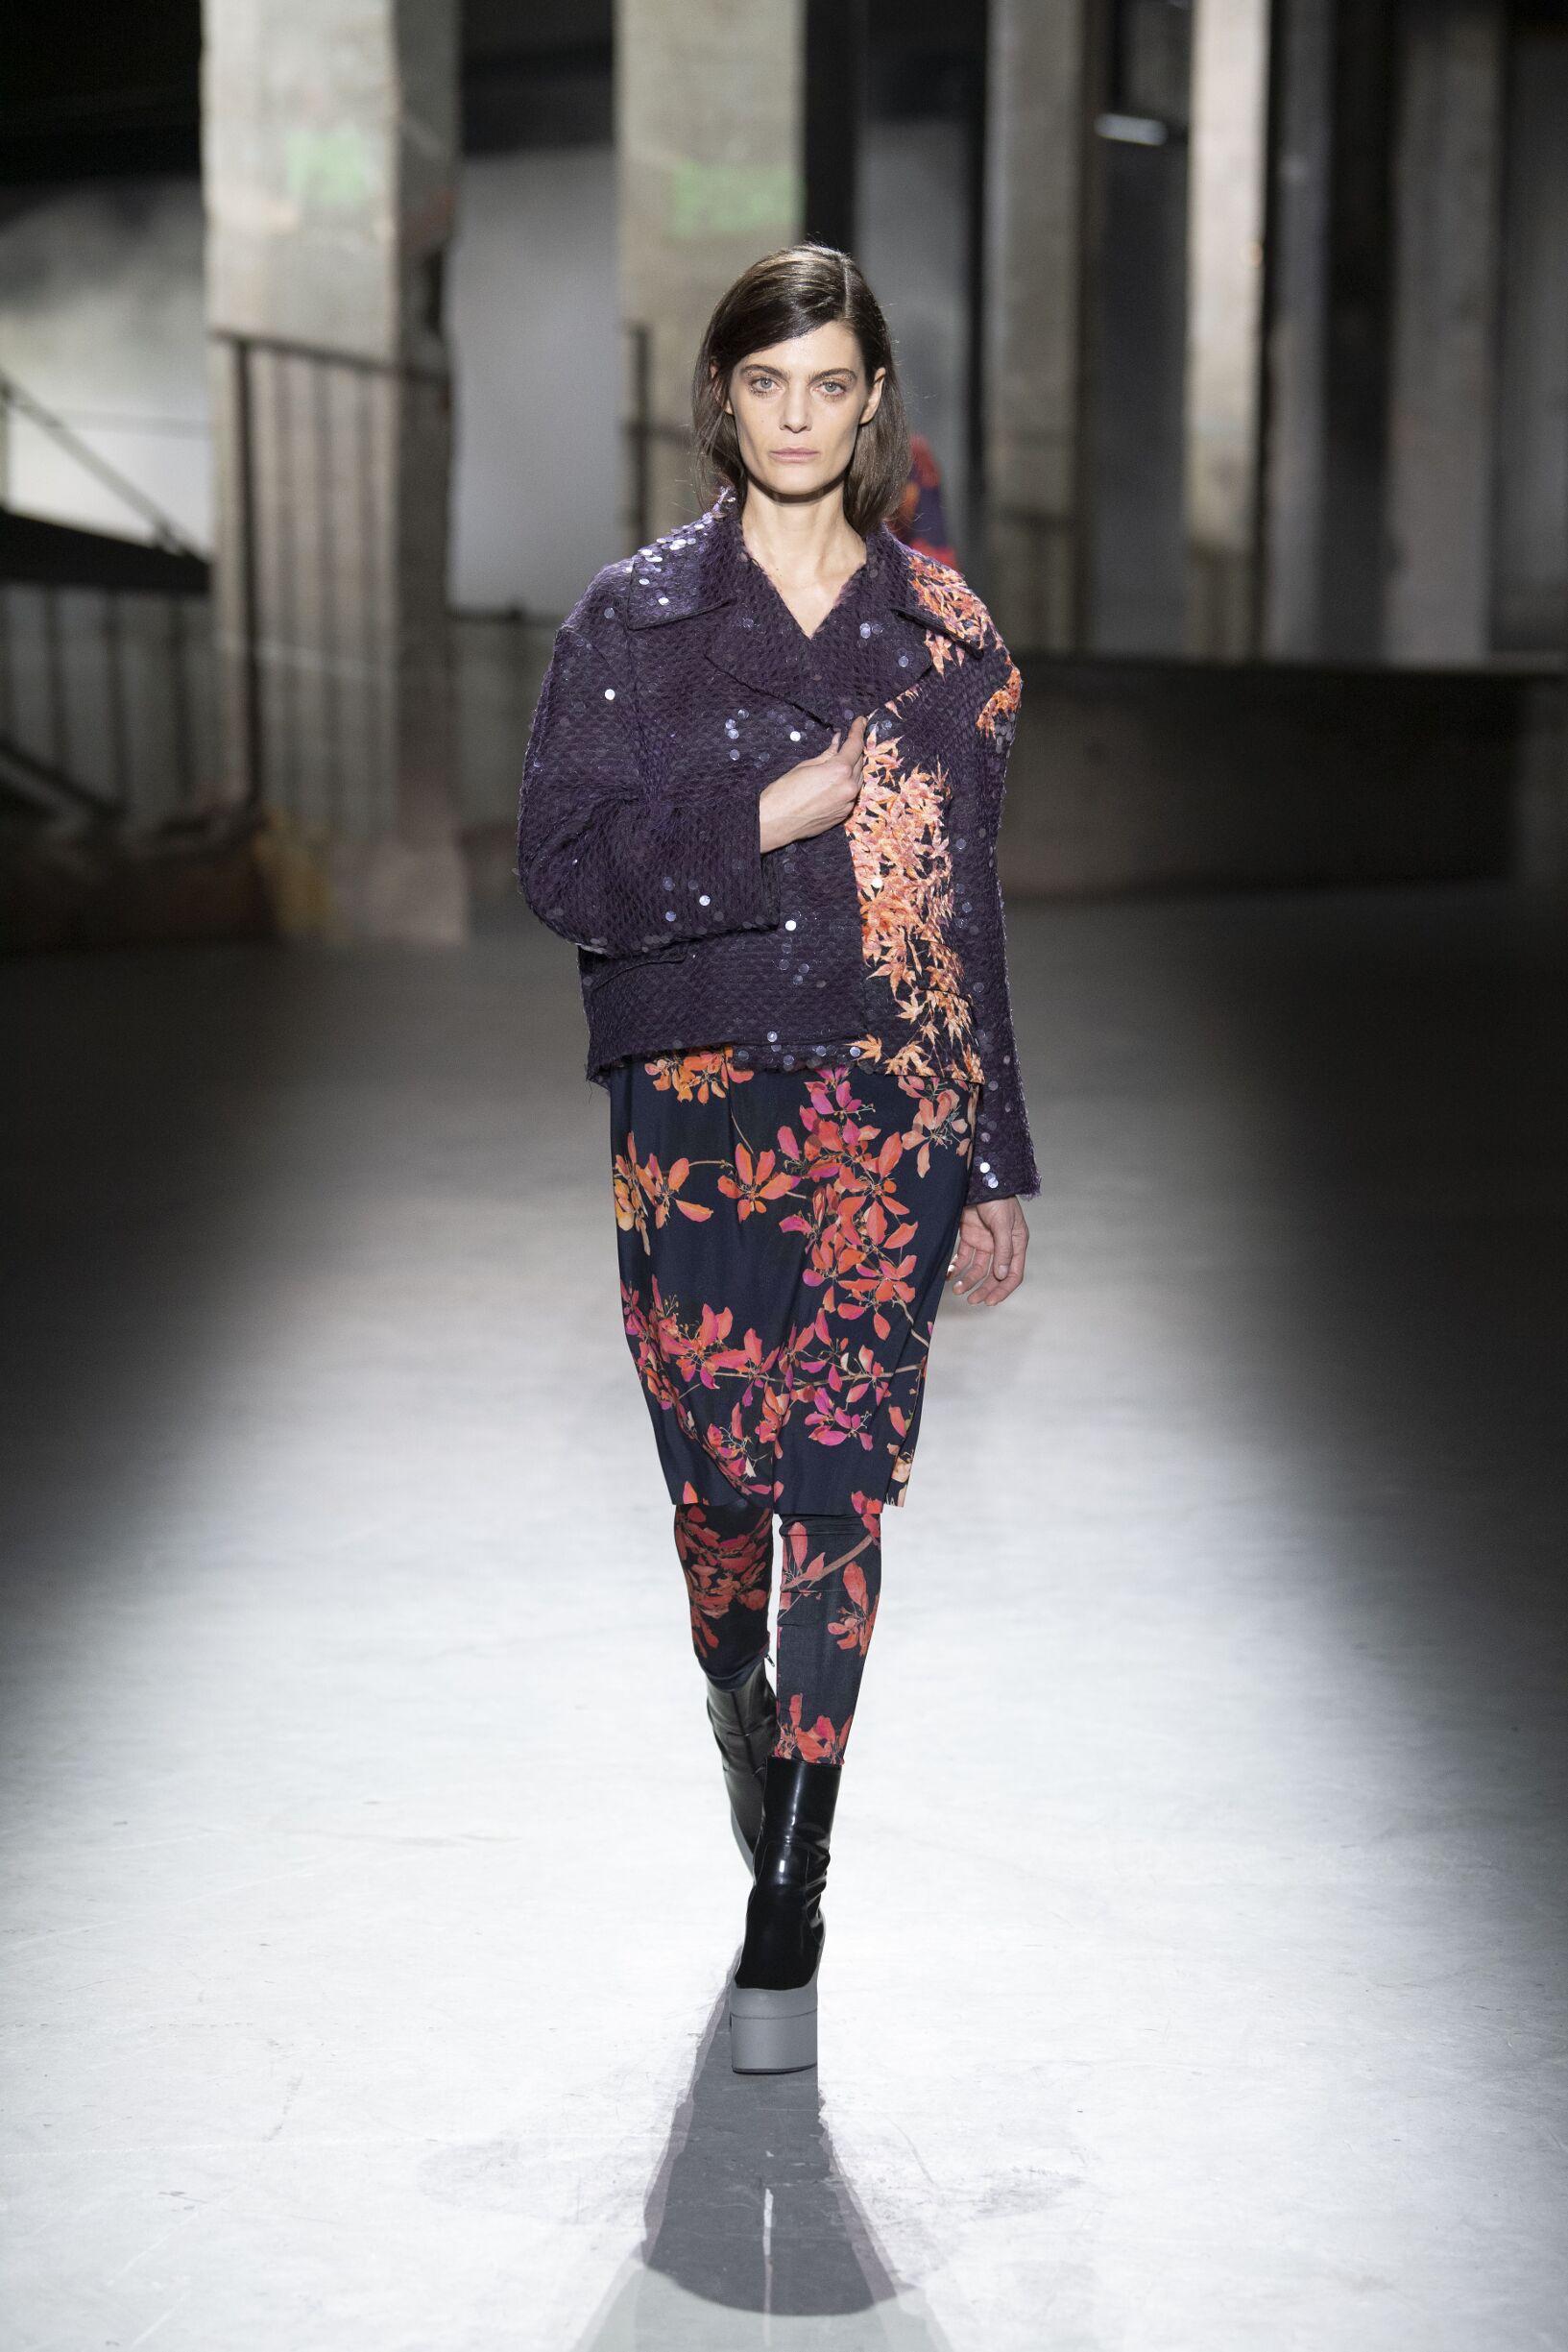 Woman FW 2019 Dries van Noten Show Paris Fashion Week